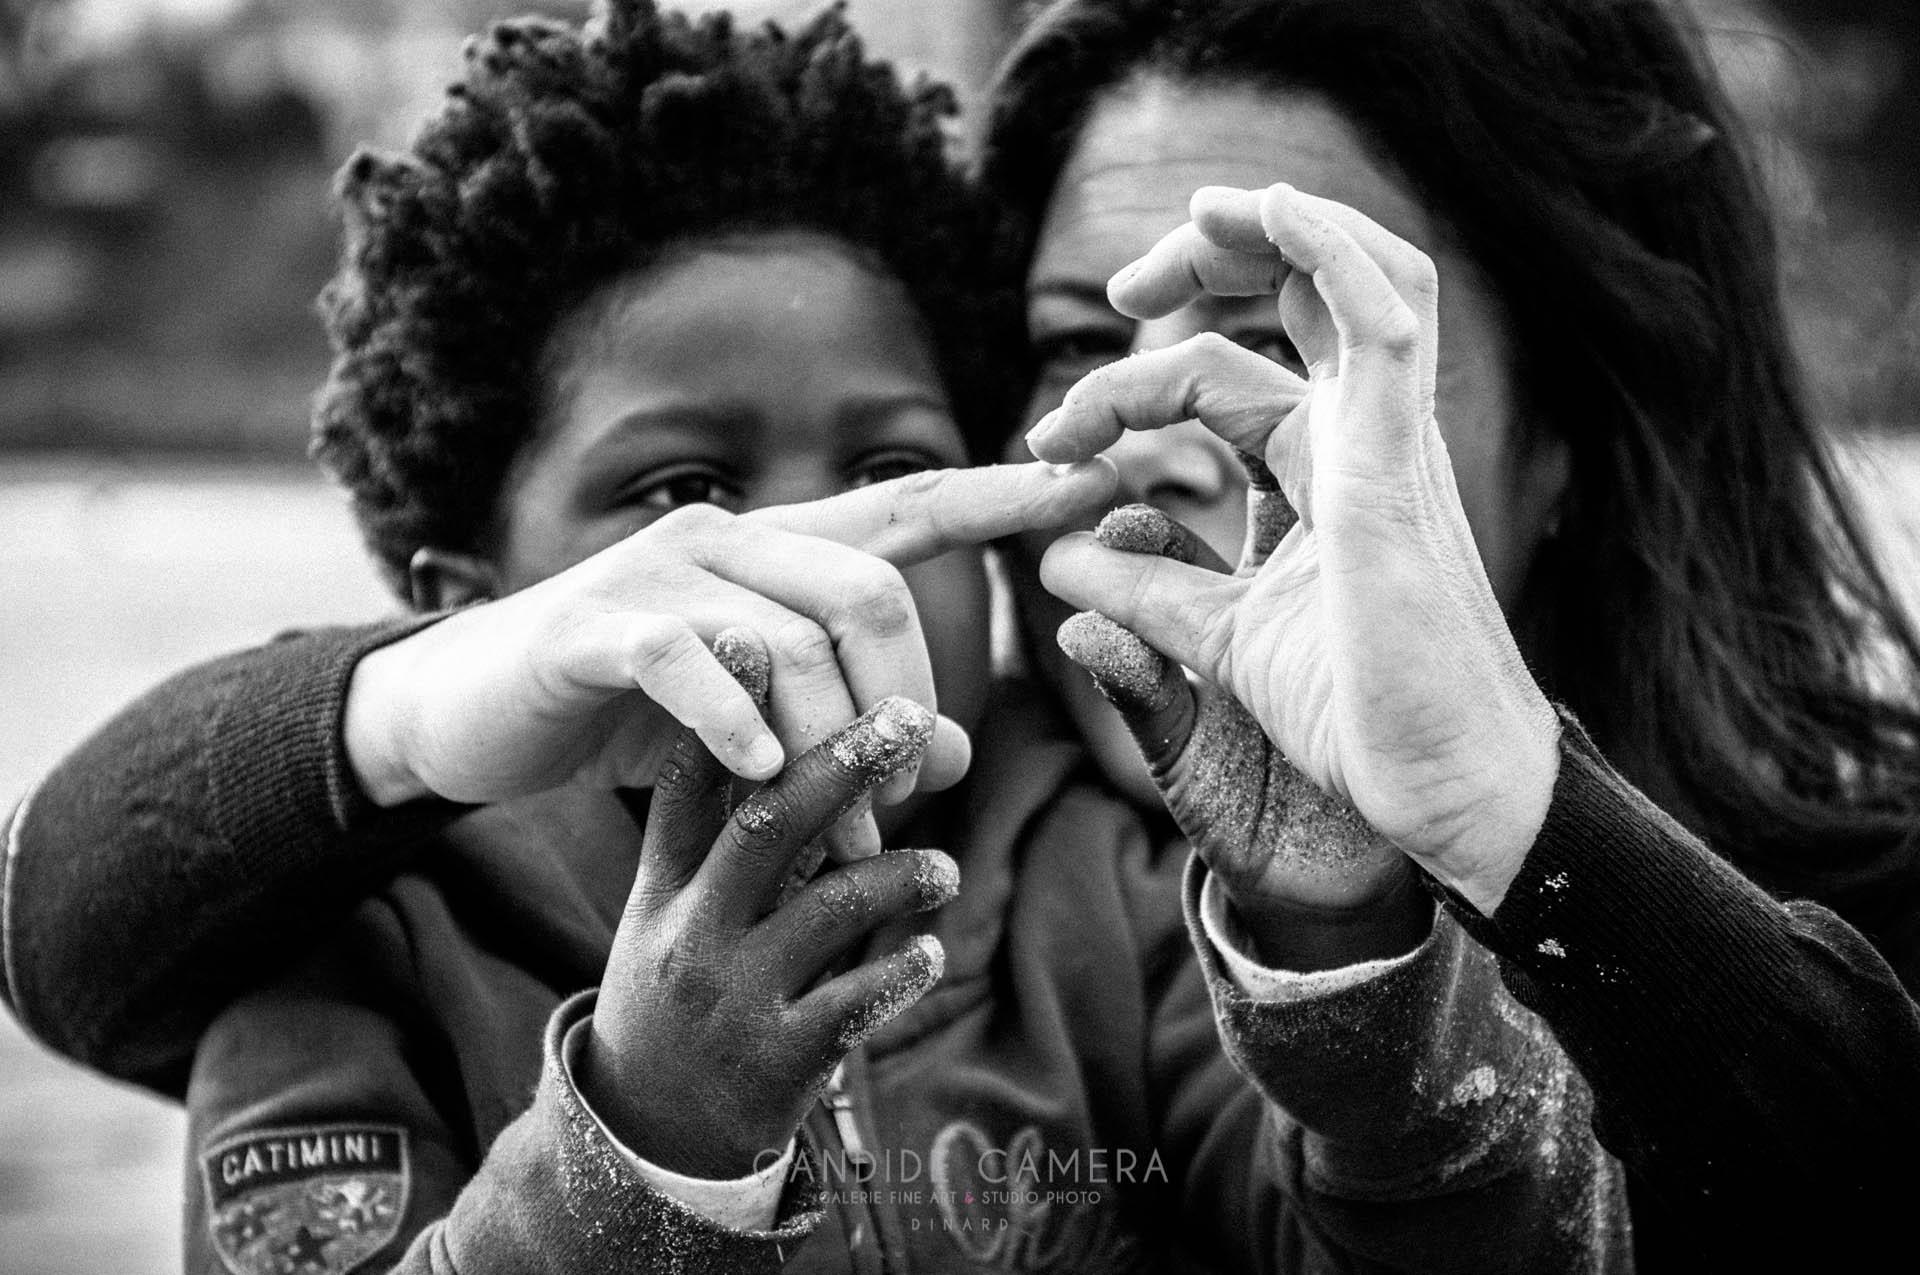 GALERIE_CANDIDE_CAMERA_PHOTOGRAPHE_DINARD_082__ASC2093